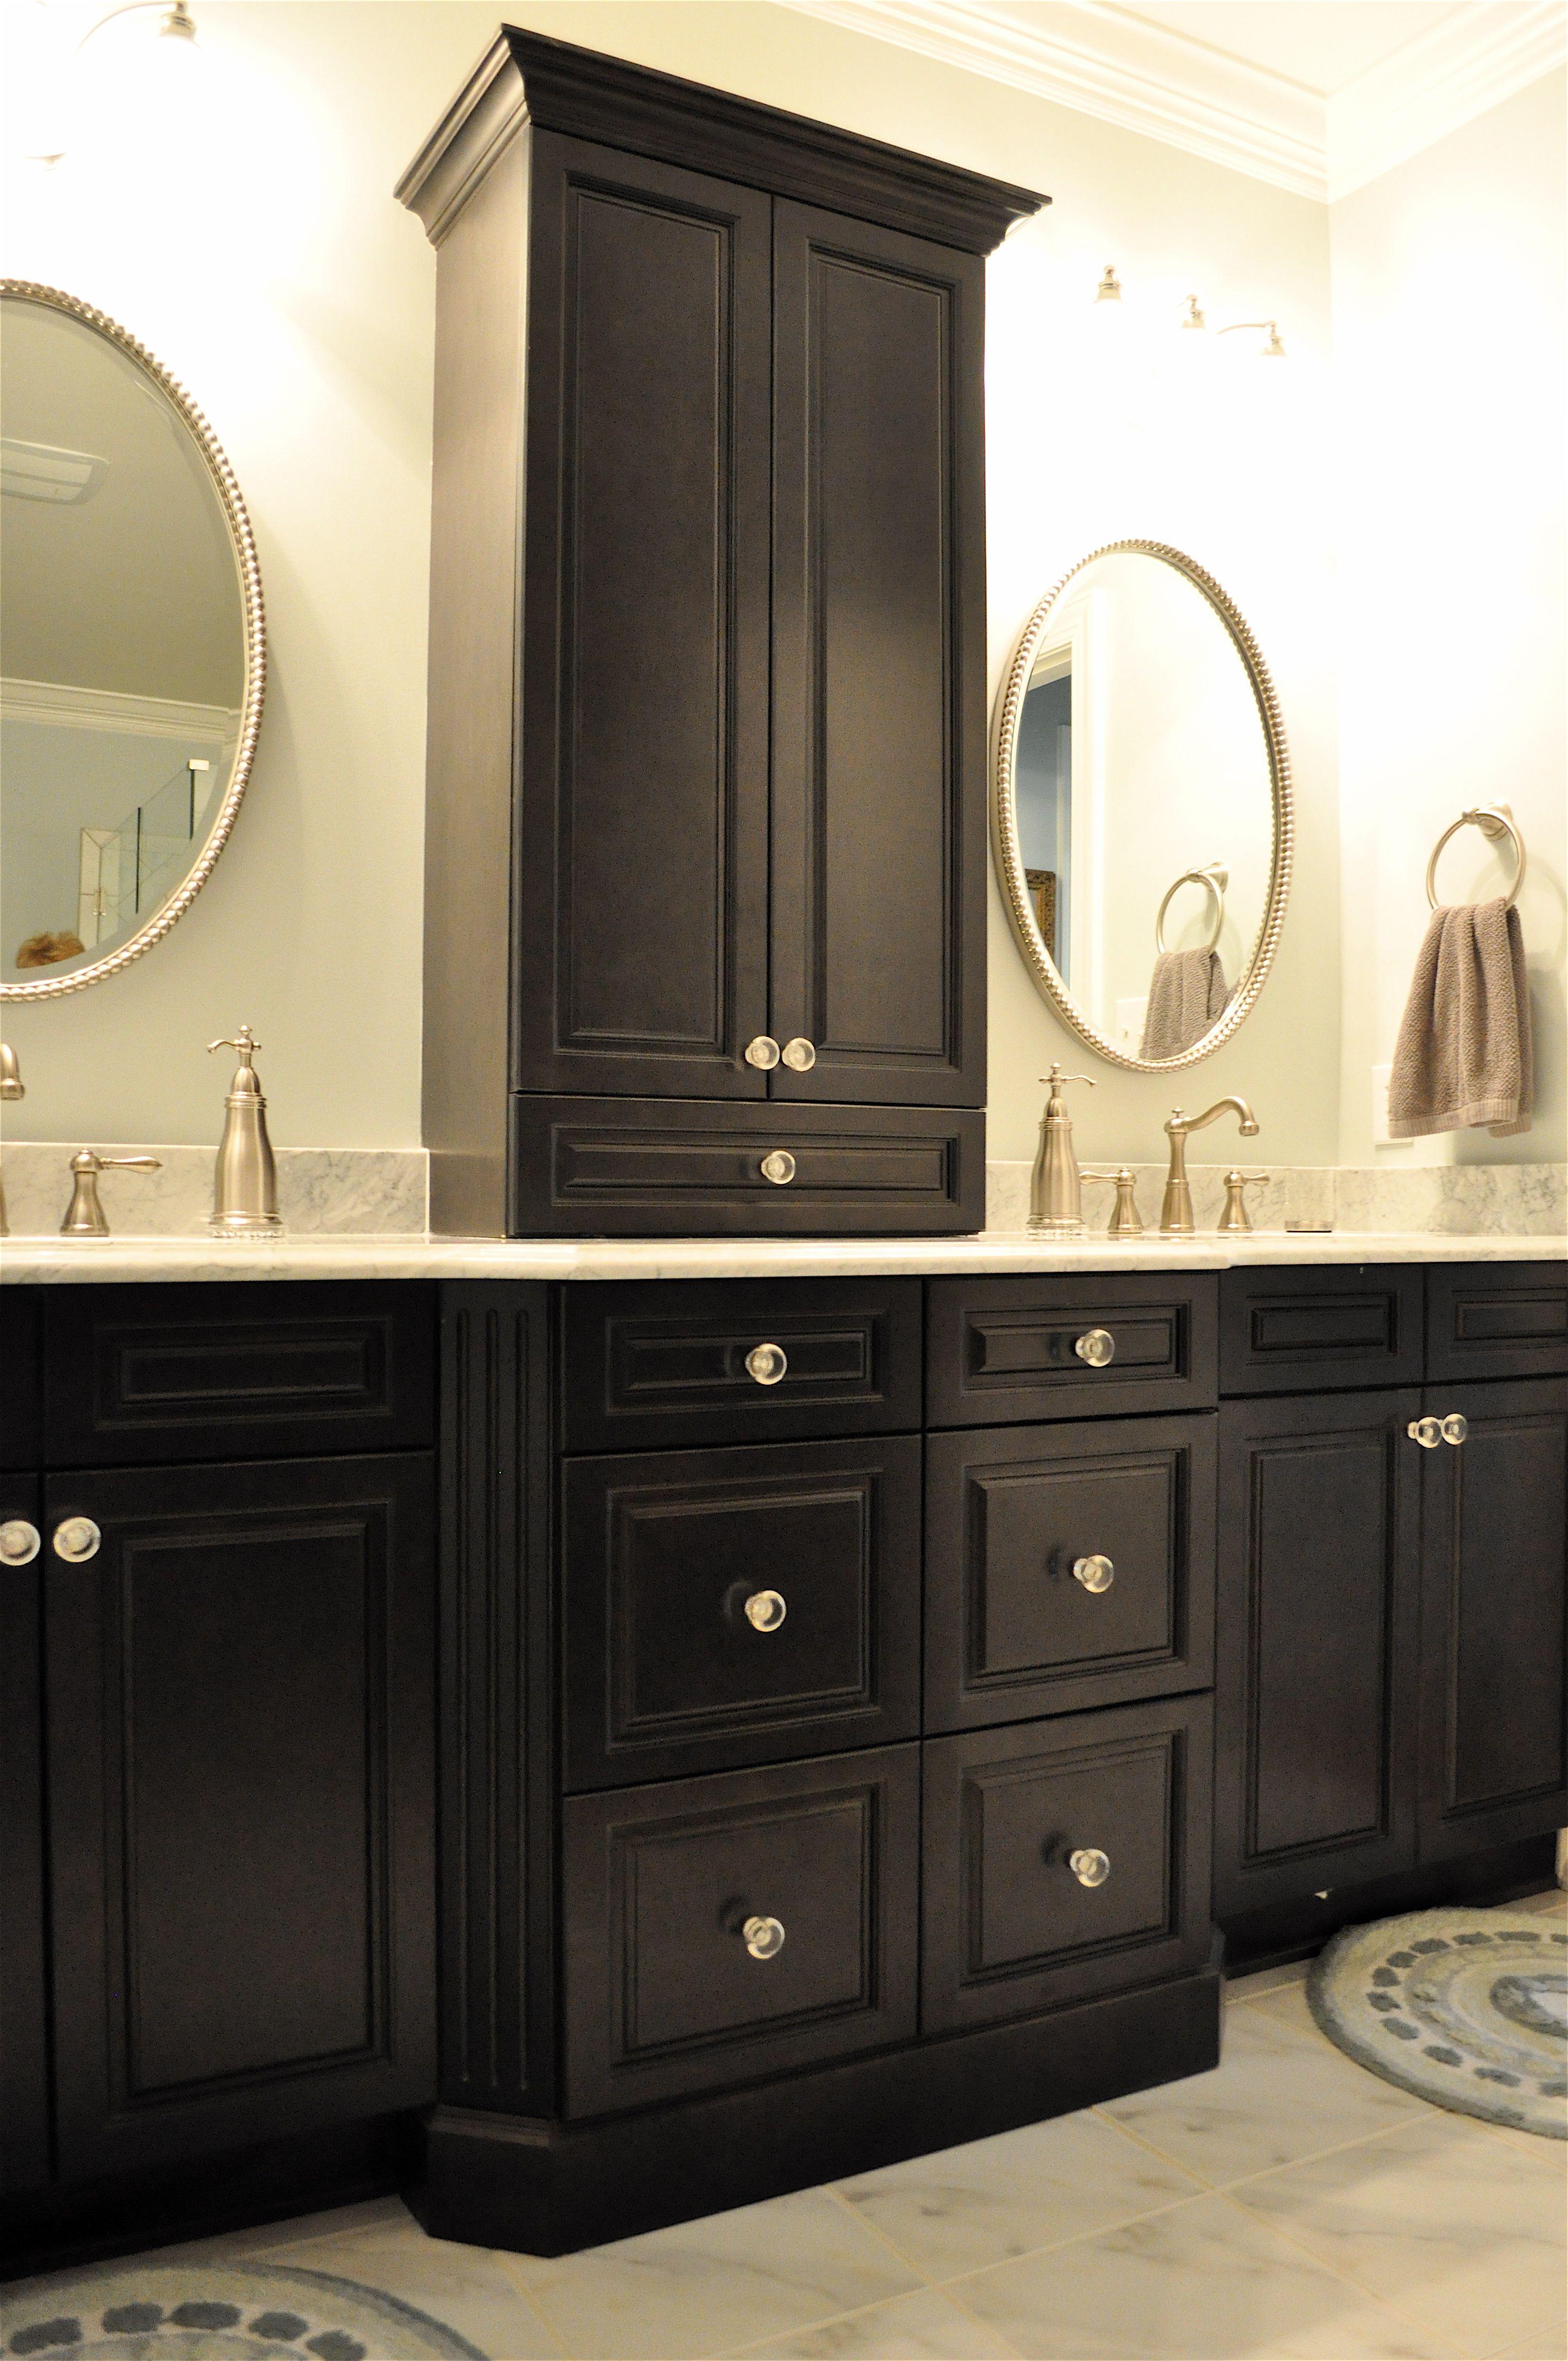 Bathroom Floor To Ceiling Cabinet Stribal Design inside sizing 2848 X 4288